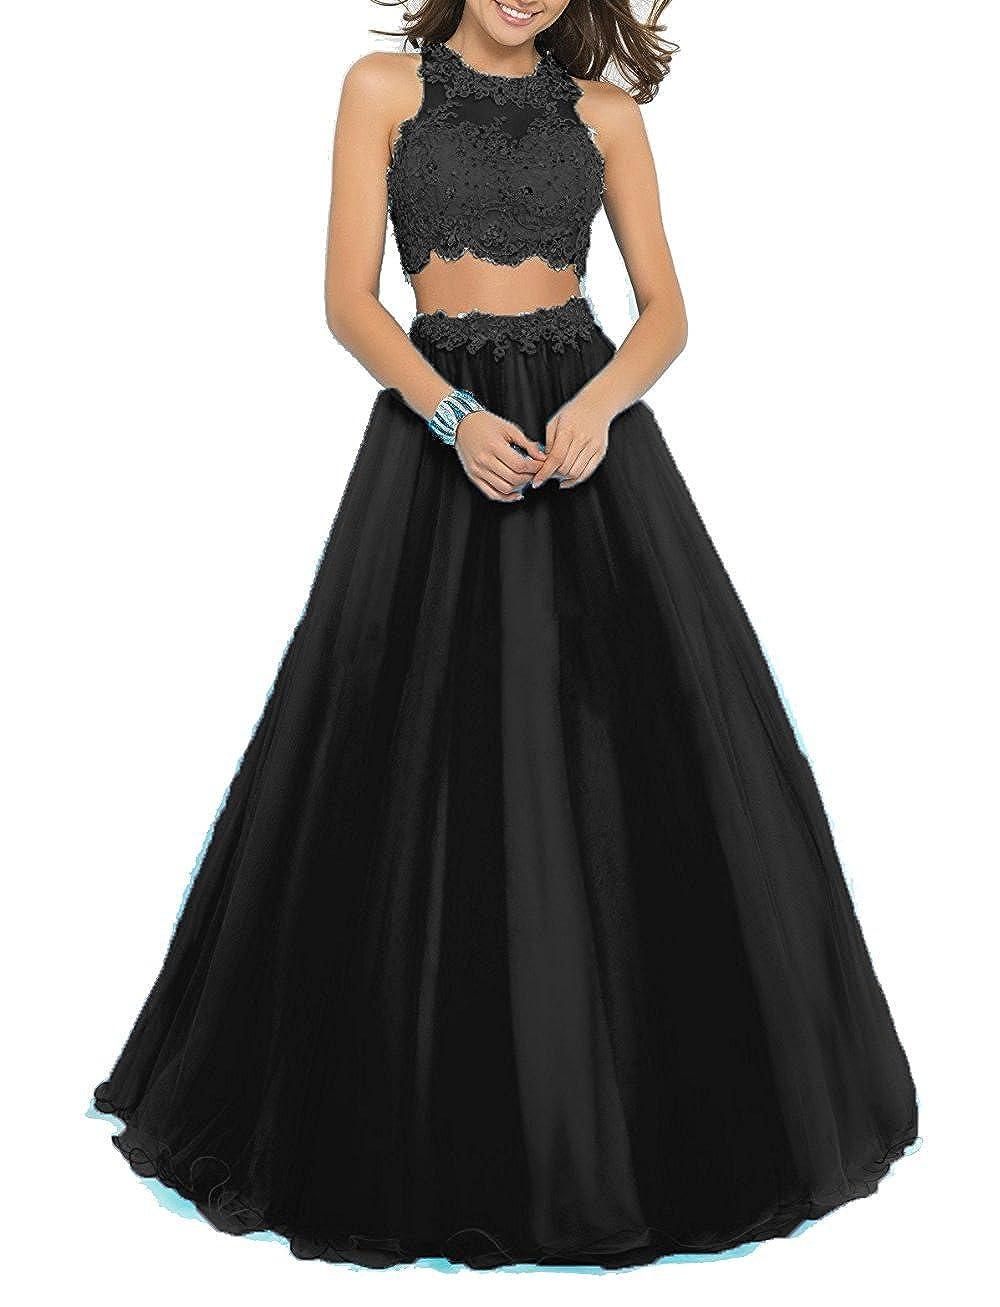 36da95eb29 Amazon.com  BessDress Two Piece Lace Bodice Long Prom Dresses Beads  Homecoming Dresses BD016  Clothing